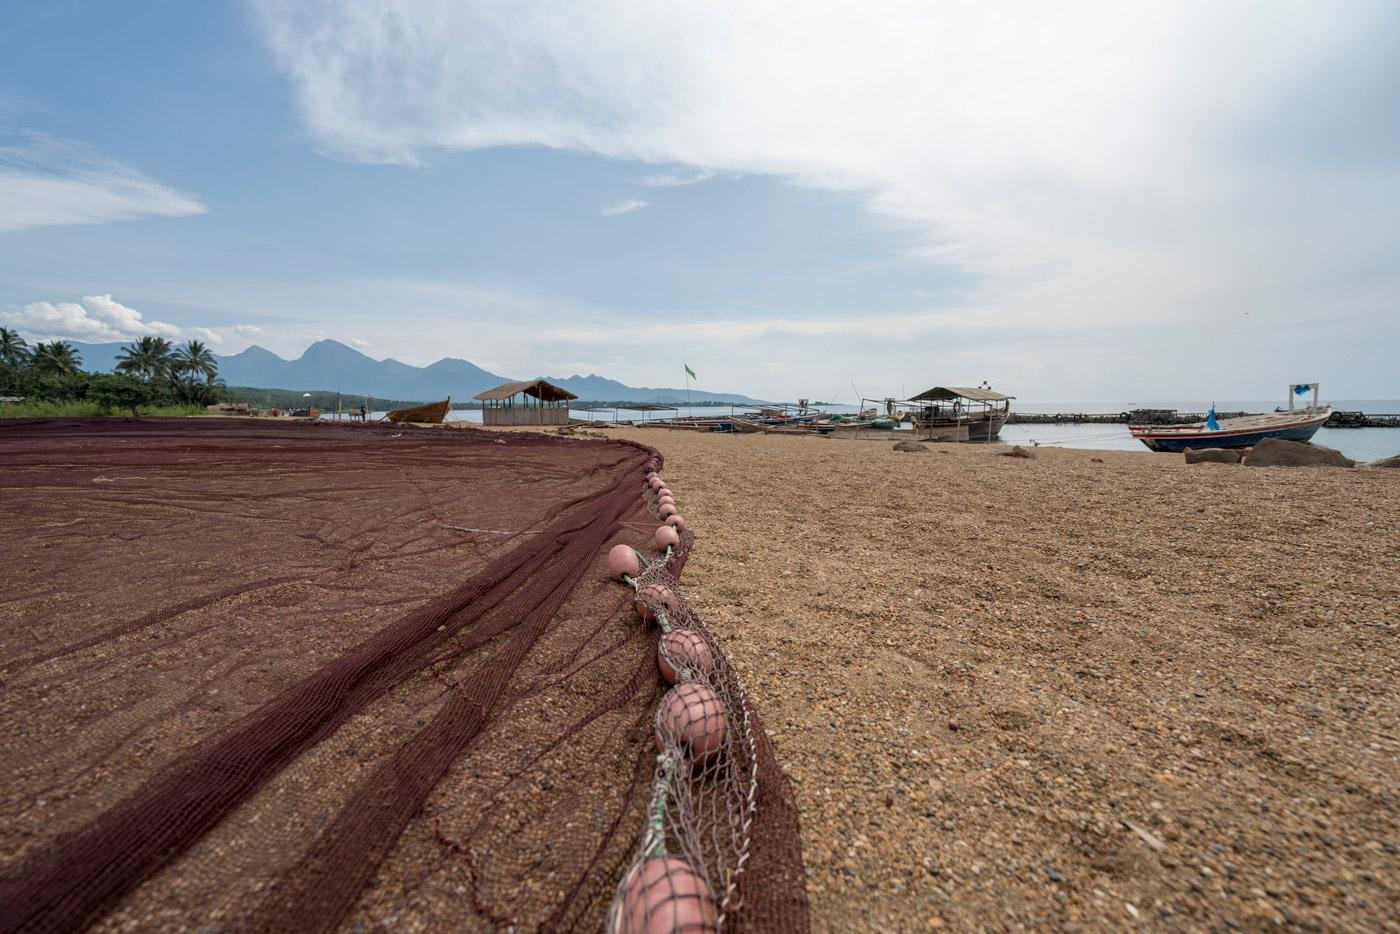 Fishing nets on the shore of Lake Malawi